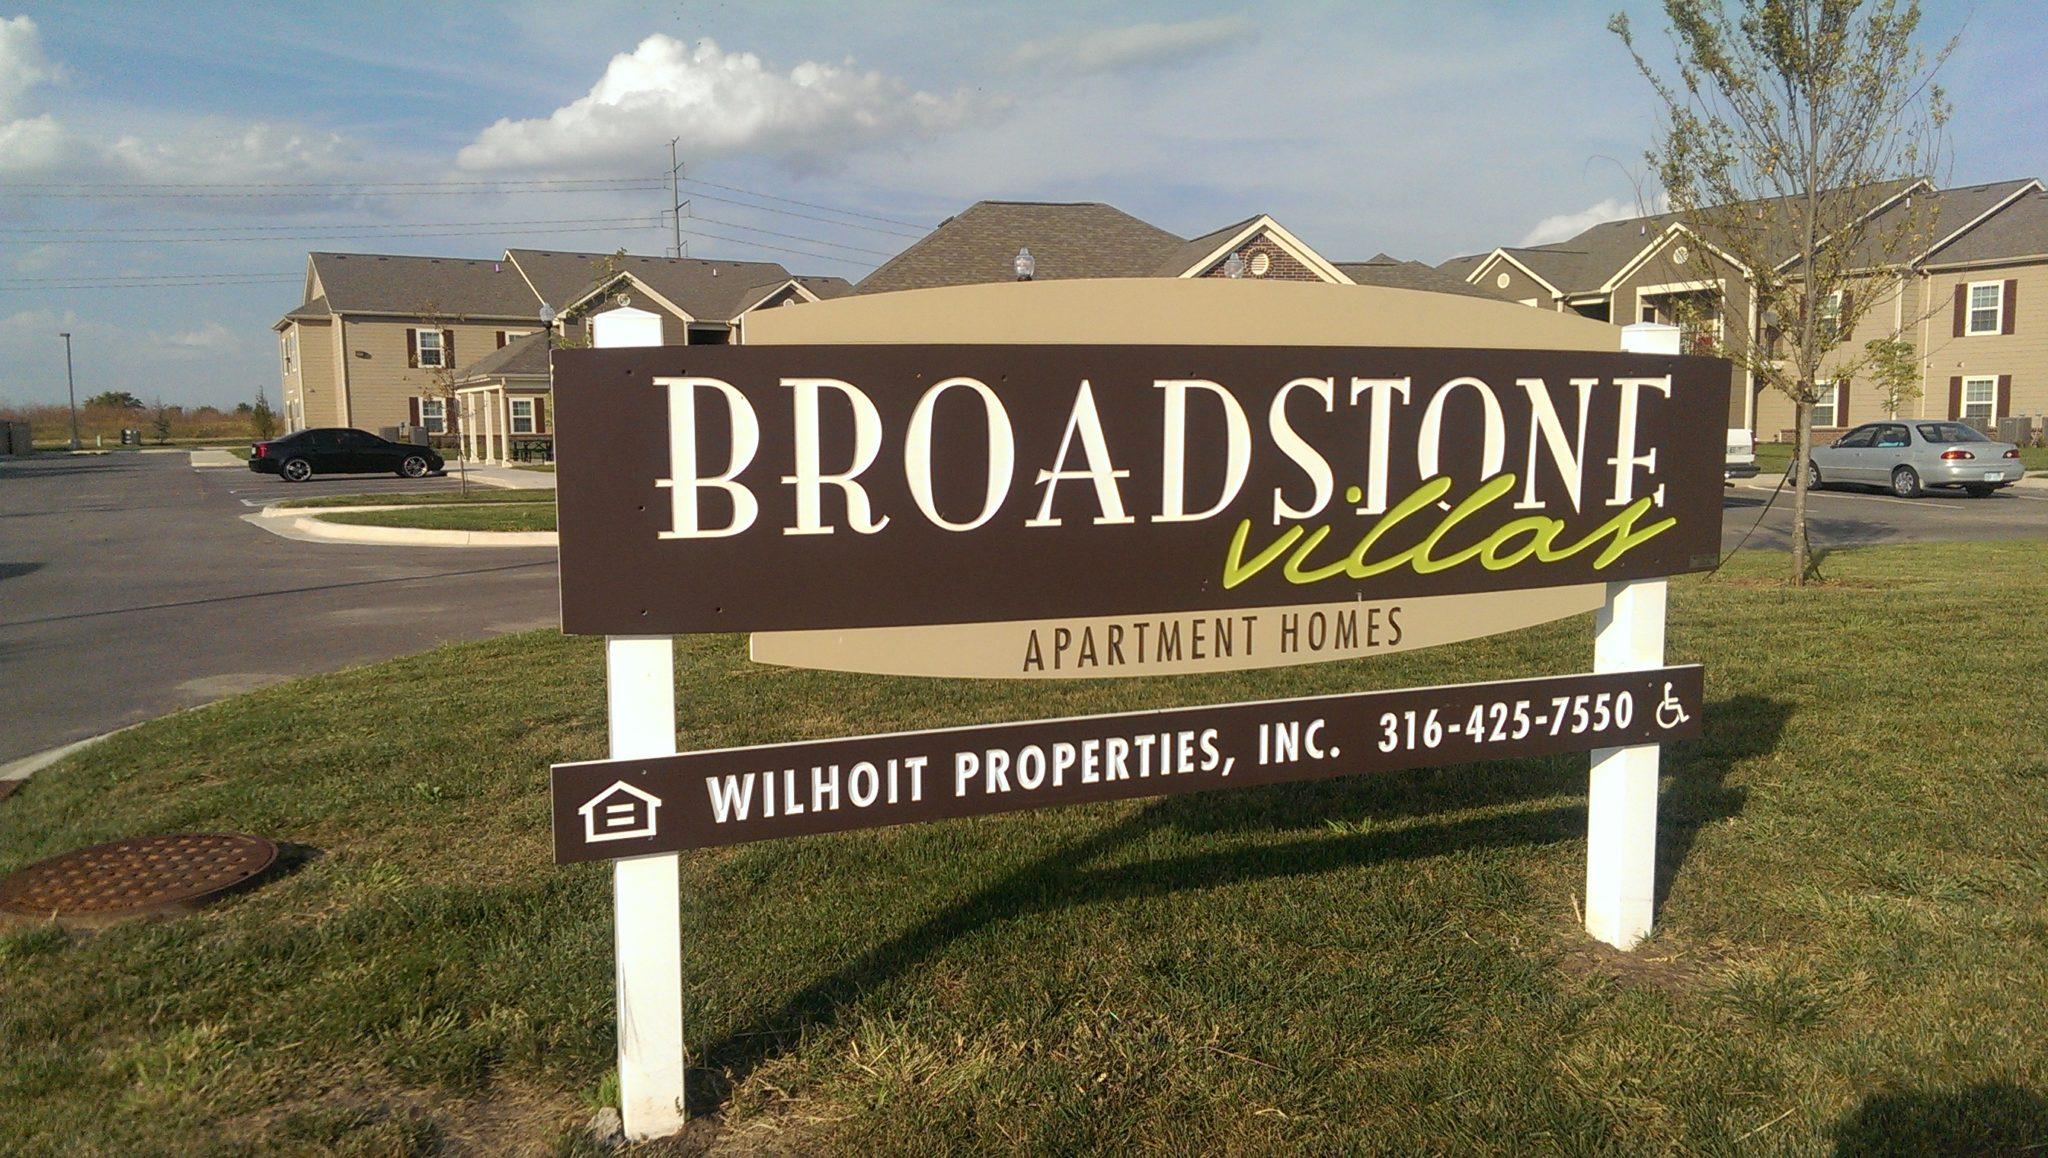 Broadstone Villas Bel Aire Kansas property sign